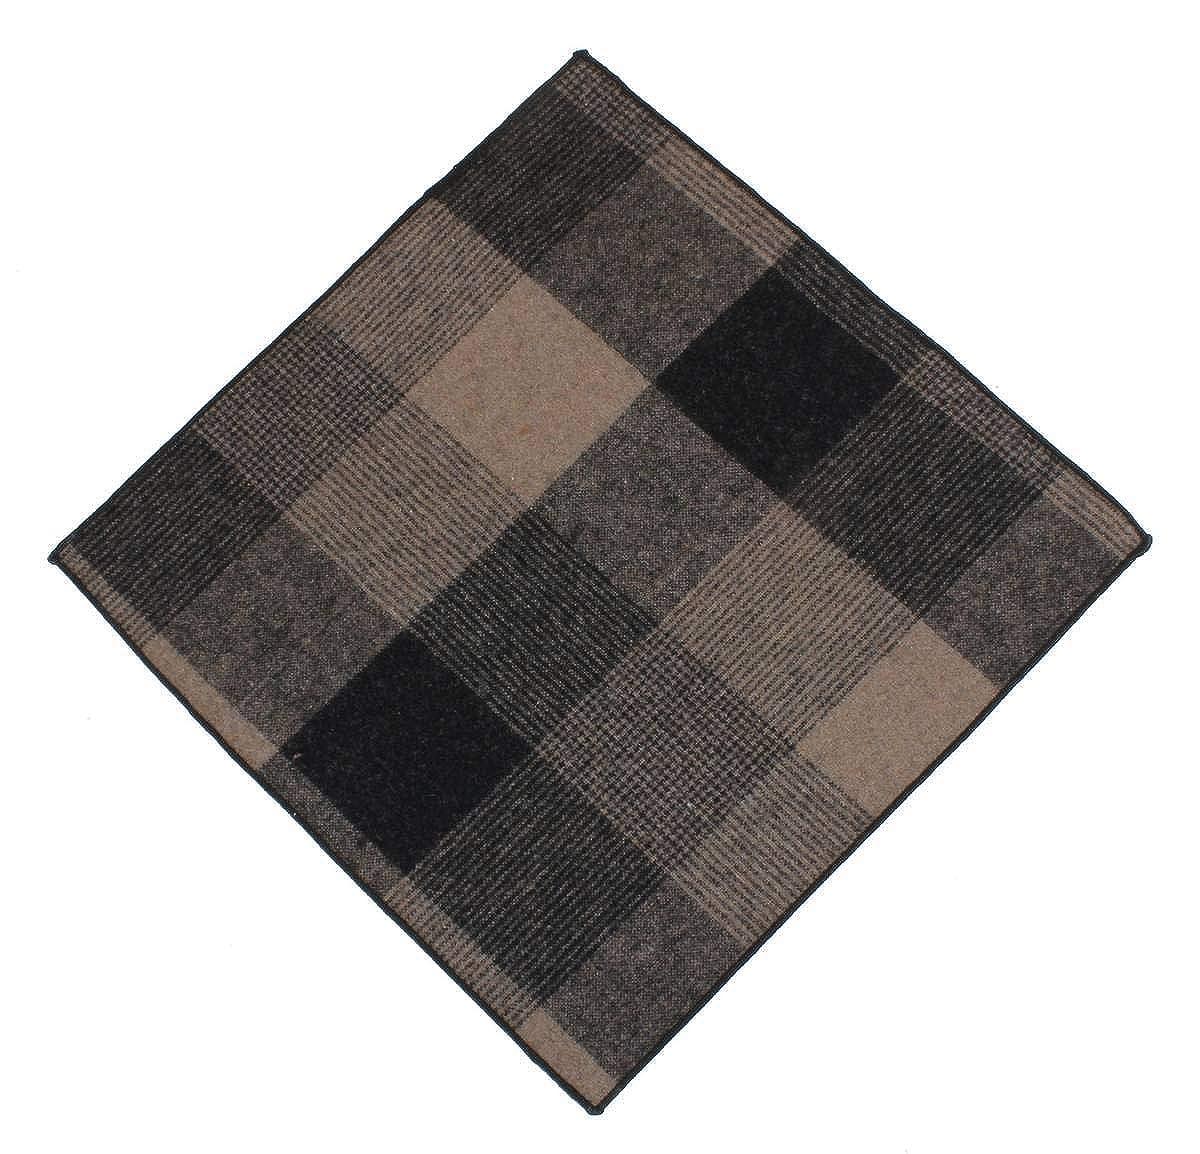 Knightsbridge Neckwear Mens Large Check Tie and Pocket Square Set Beige//Brown